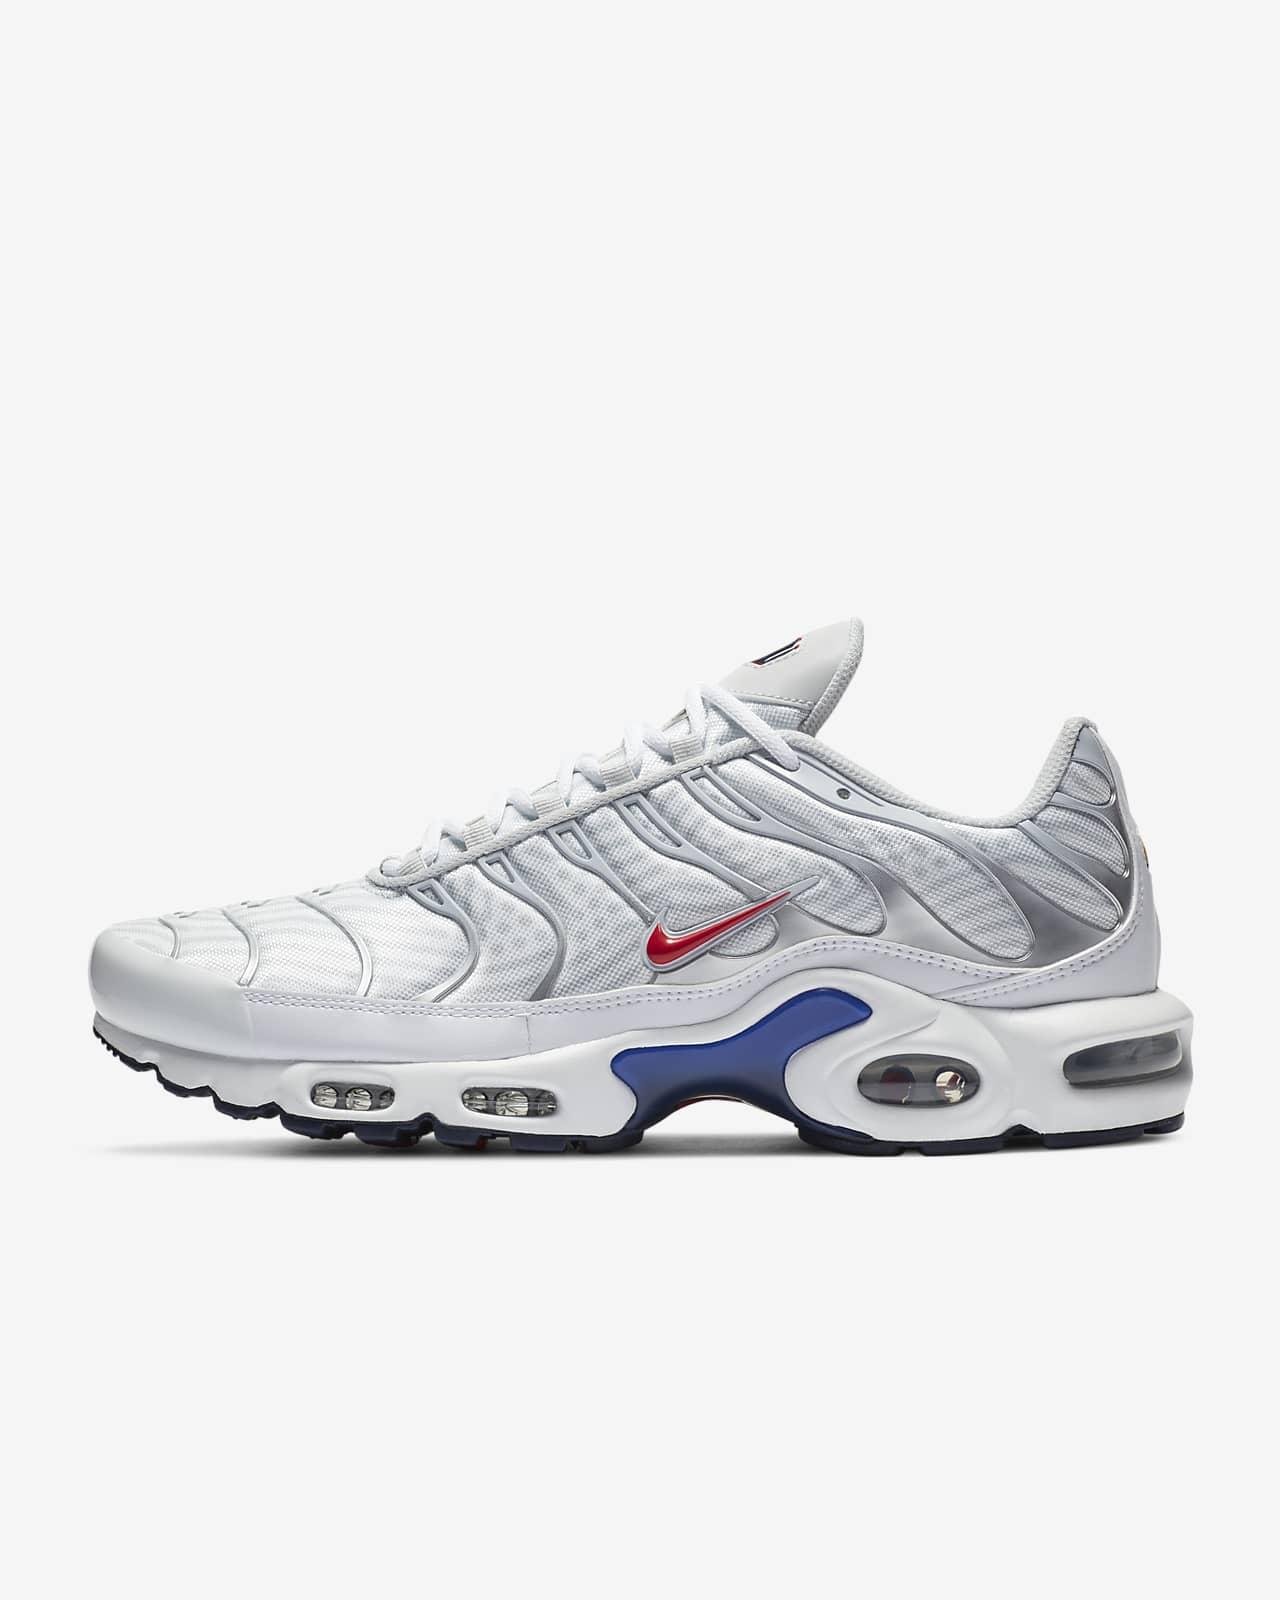 Nike Air Max Plus Men's Shoe. Nike CZ